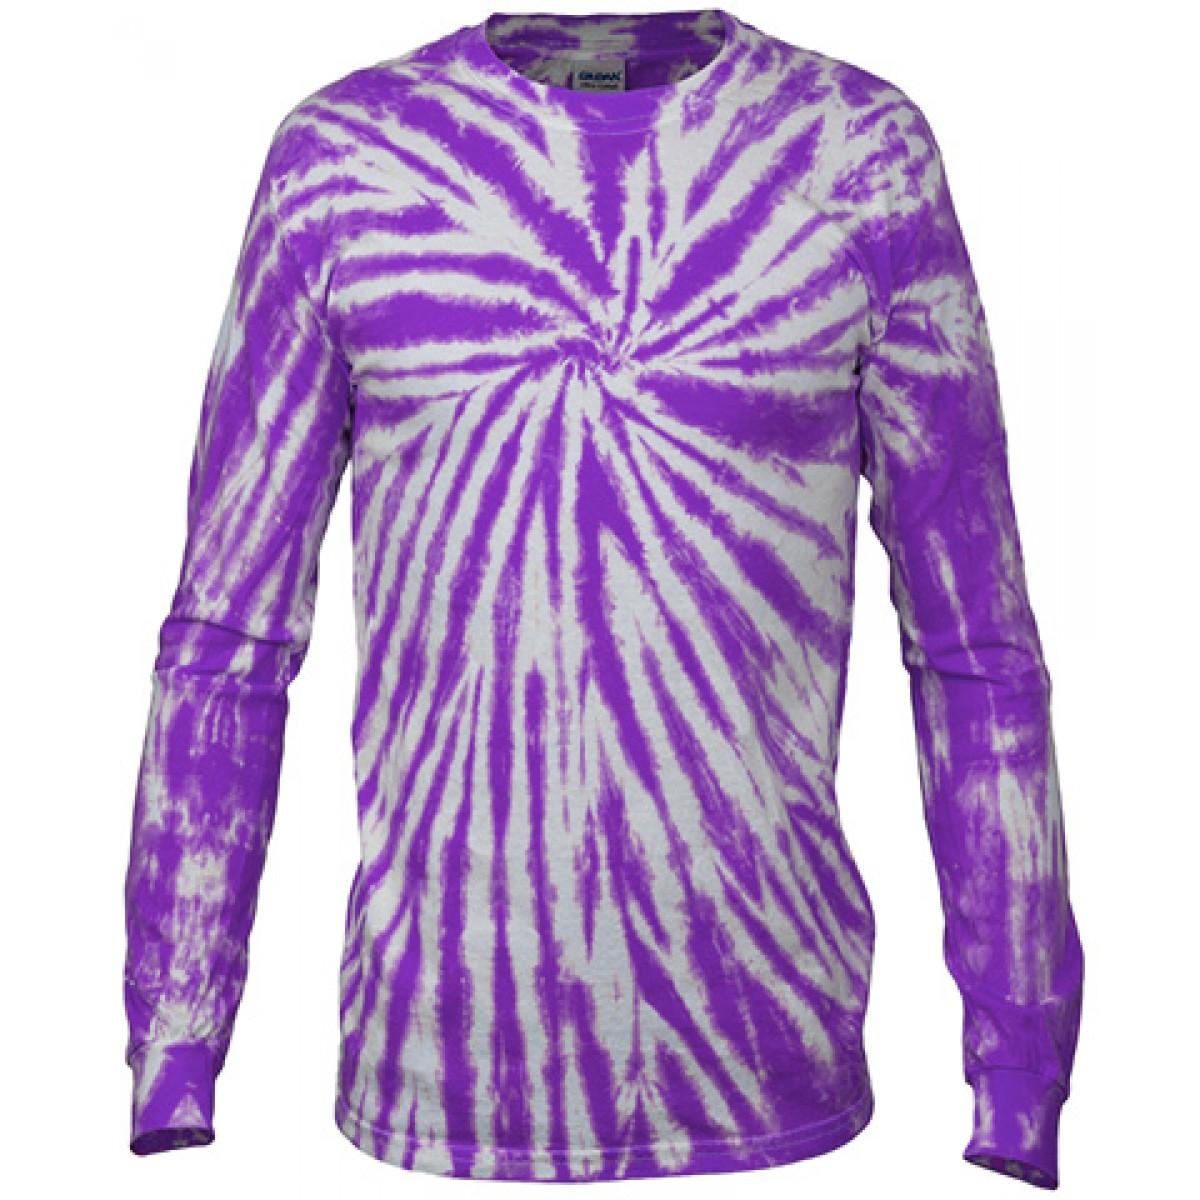 Multi Color Tie-Dye Long Sleeve Shirt -Fuscia-M